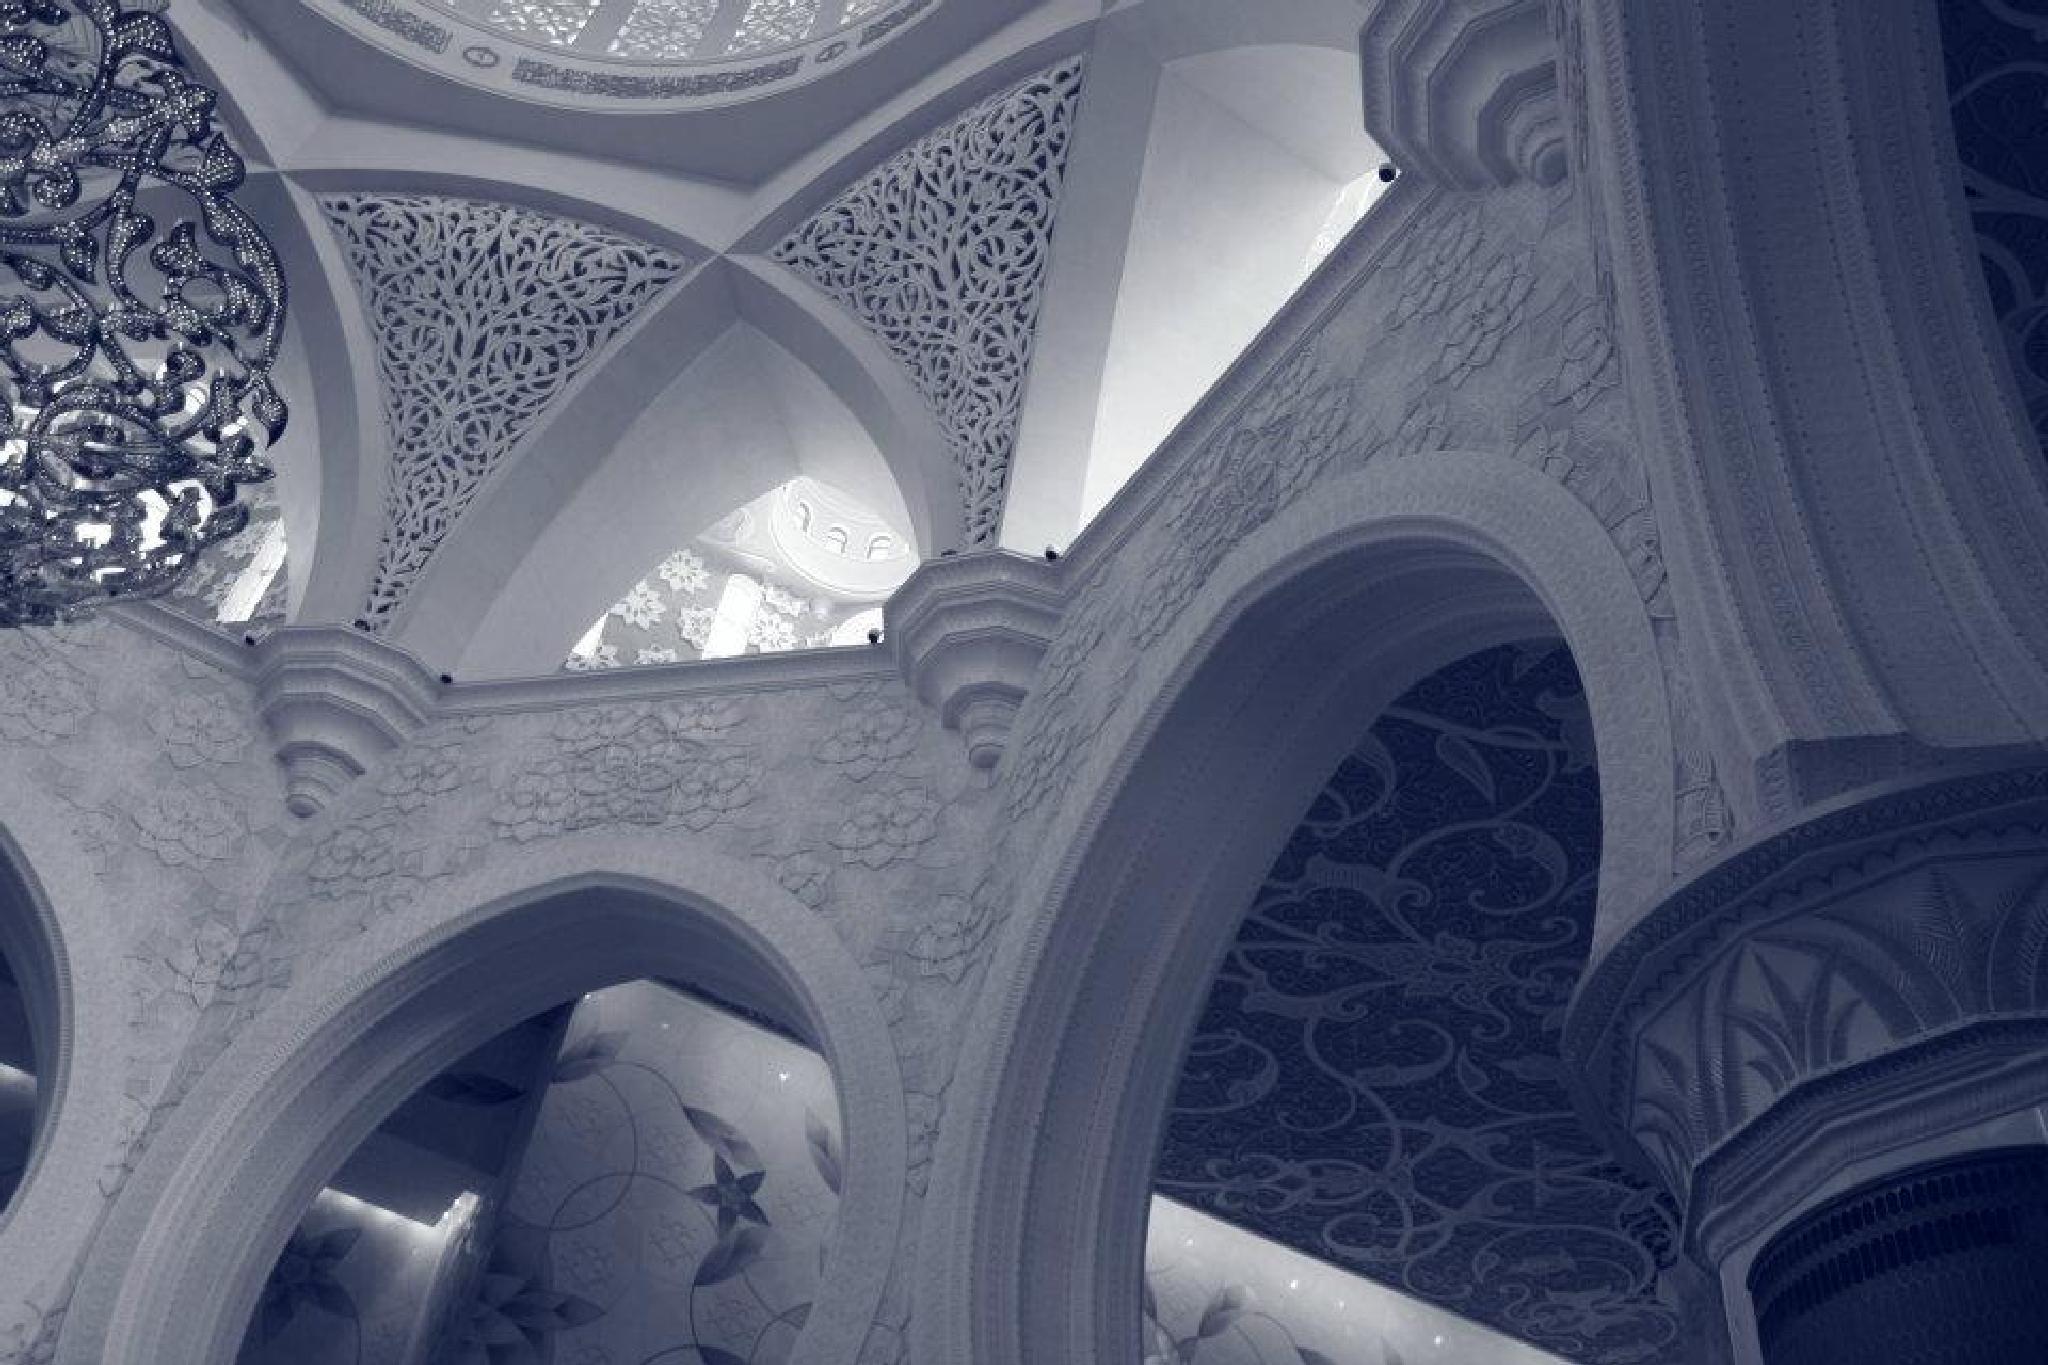 Sheikh Zayed Mosque Walls by alamaude